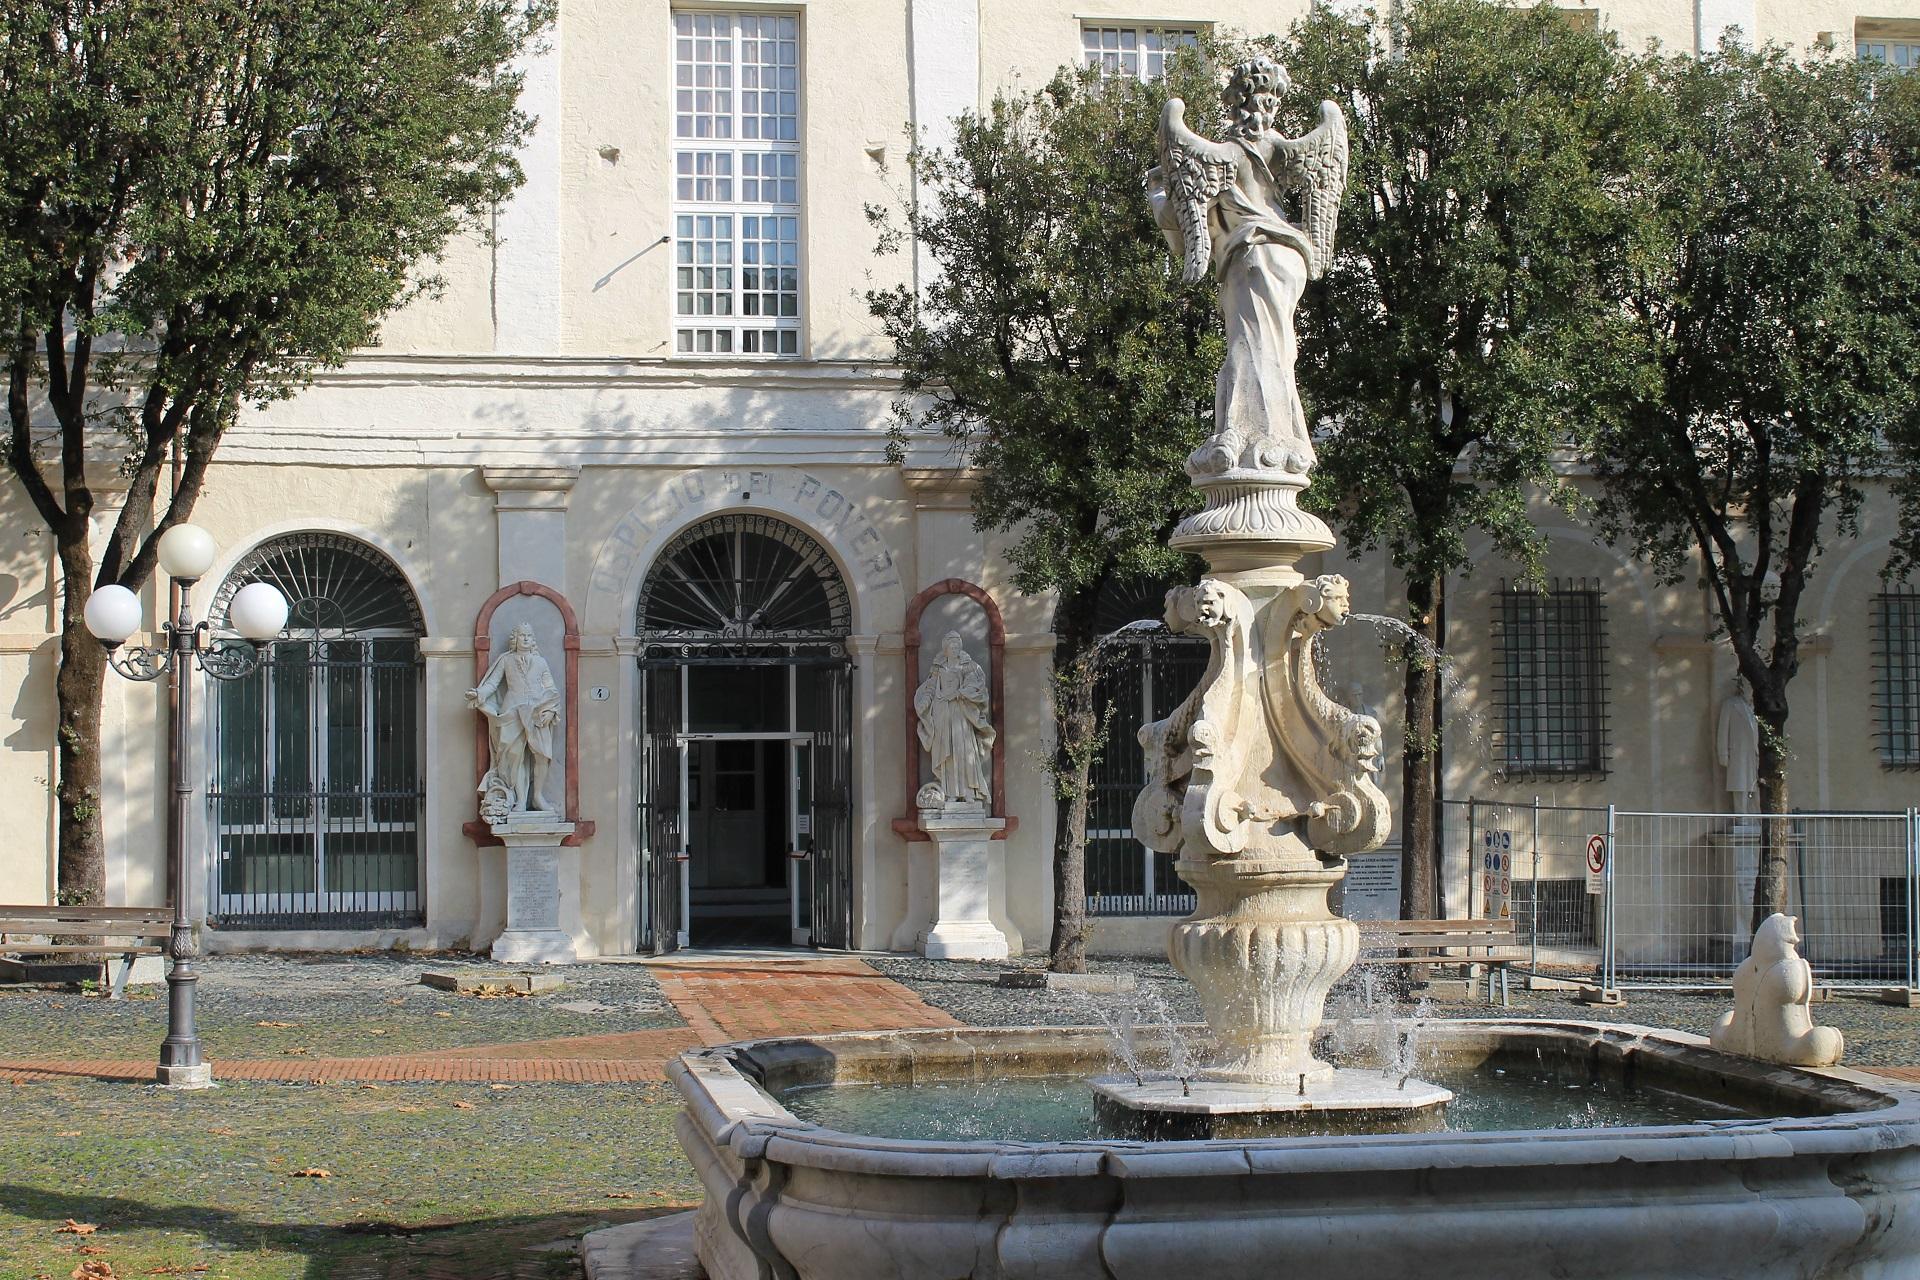 Residenza Sanitaria Assistenziale Santuario - Piazza Santuario - Savona